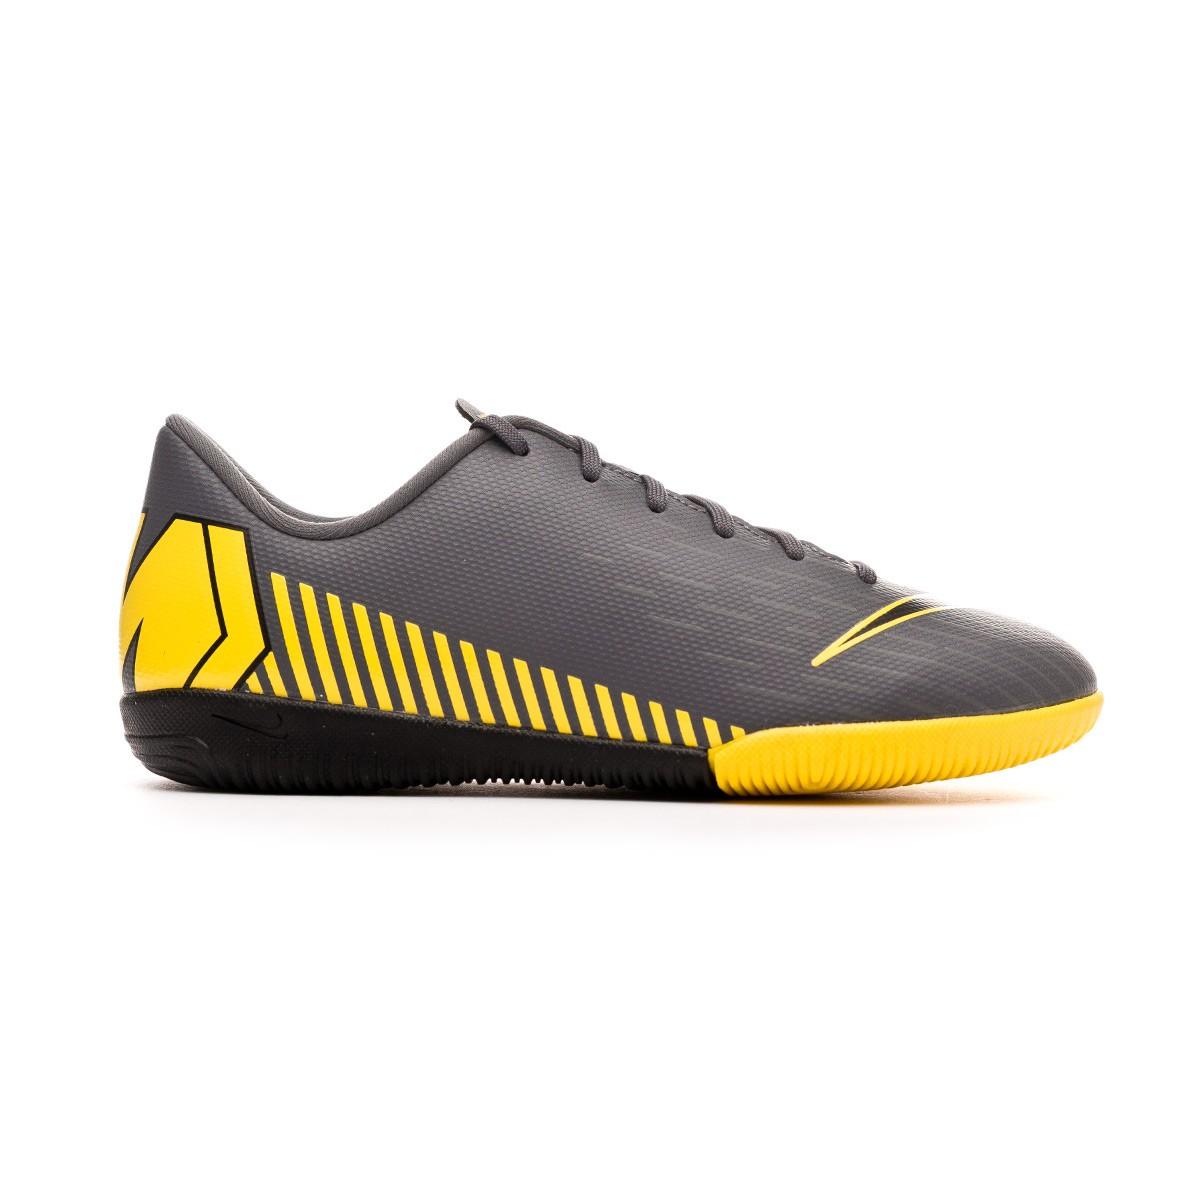 240c7357a83044 Futsal Boot Nike Kids Mercurial VaporX XII Academy IC Dark  grey-Black-Optical yellow - Tienda de fútbol Fútbol Emotion